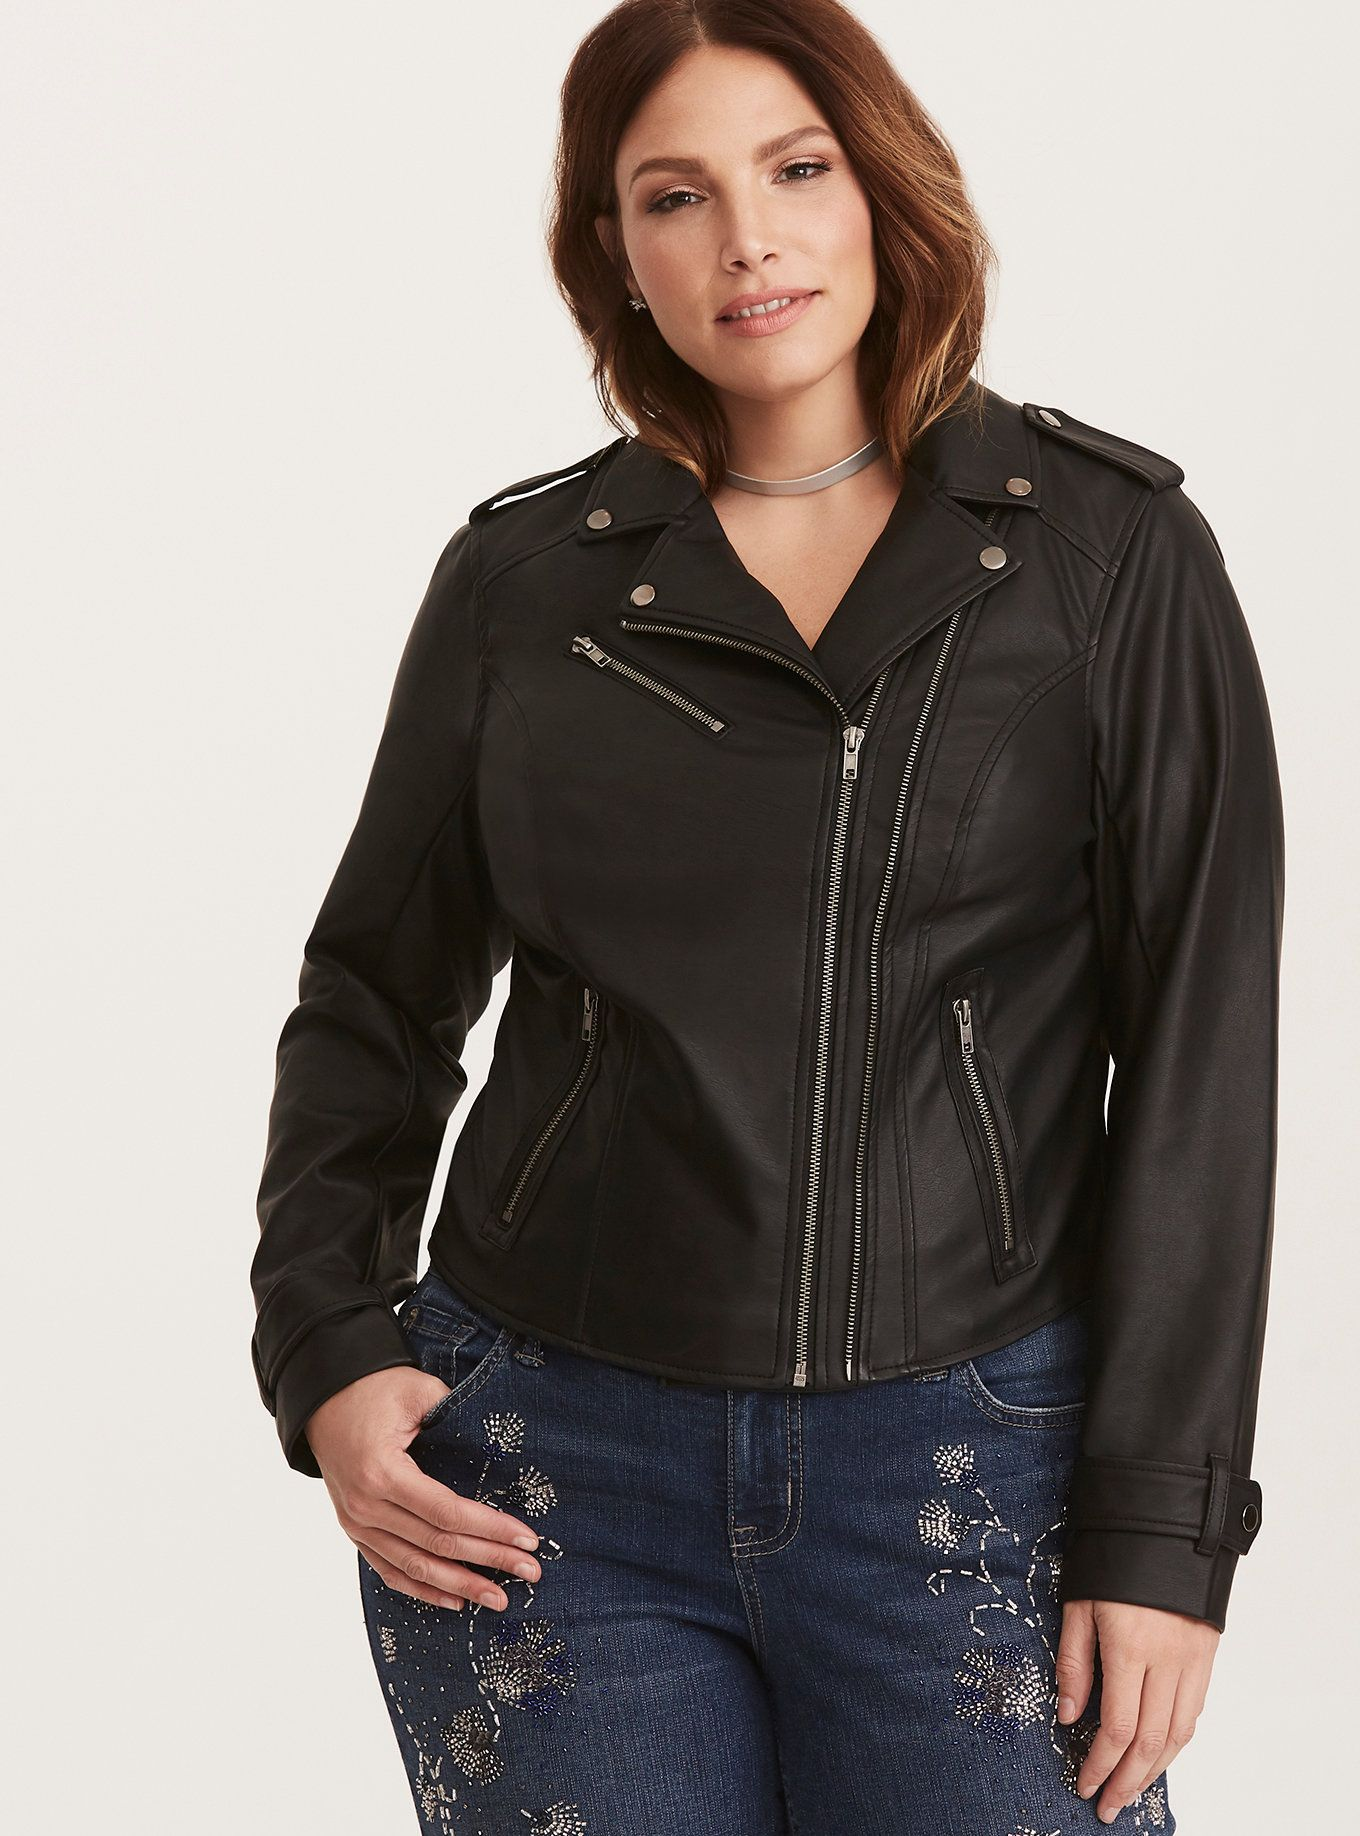 Zipper Faux Leather Moto Jacket Black moto jacket